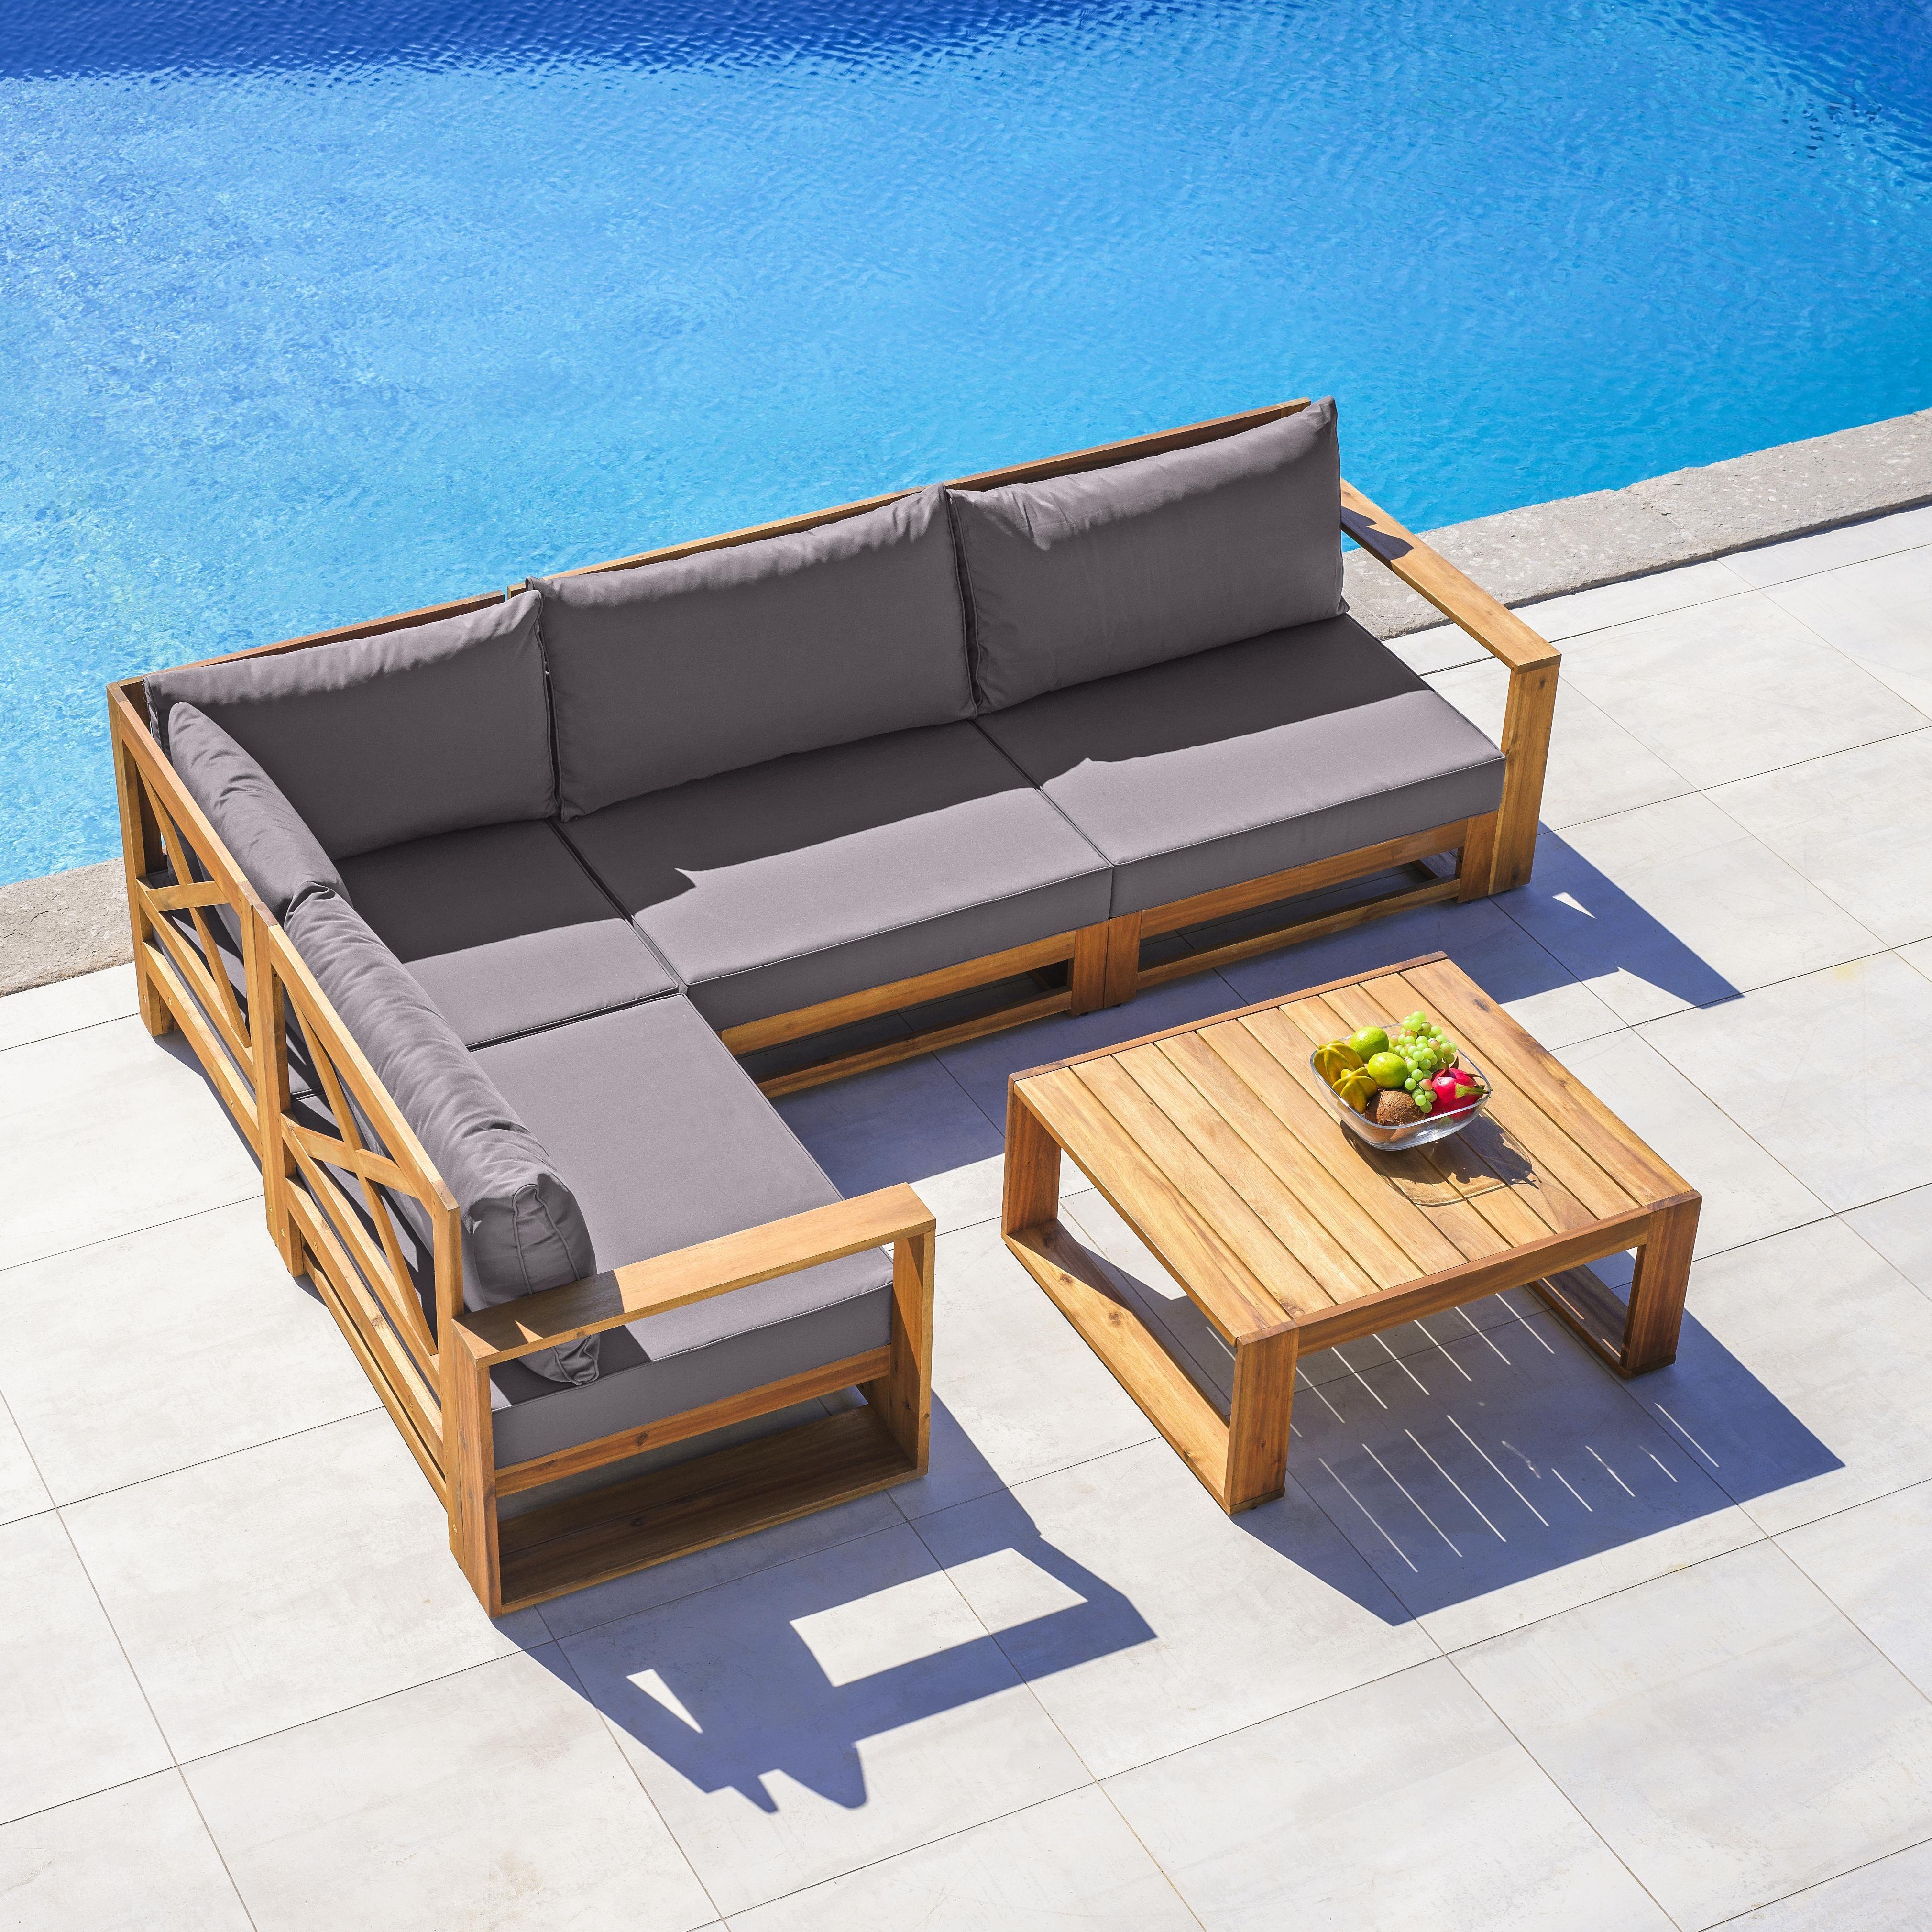 Loungegarnitur Kerry Aus Akazienholz 11-teilig - Dunkelgrau/Akaziefarben, MODERN, Holz/Textil - Modern Living